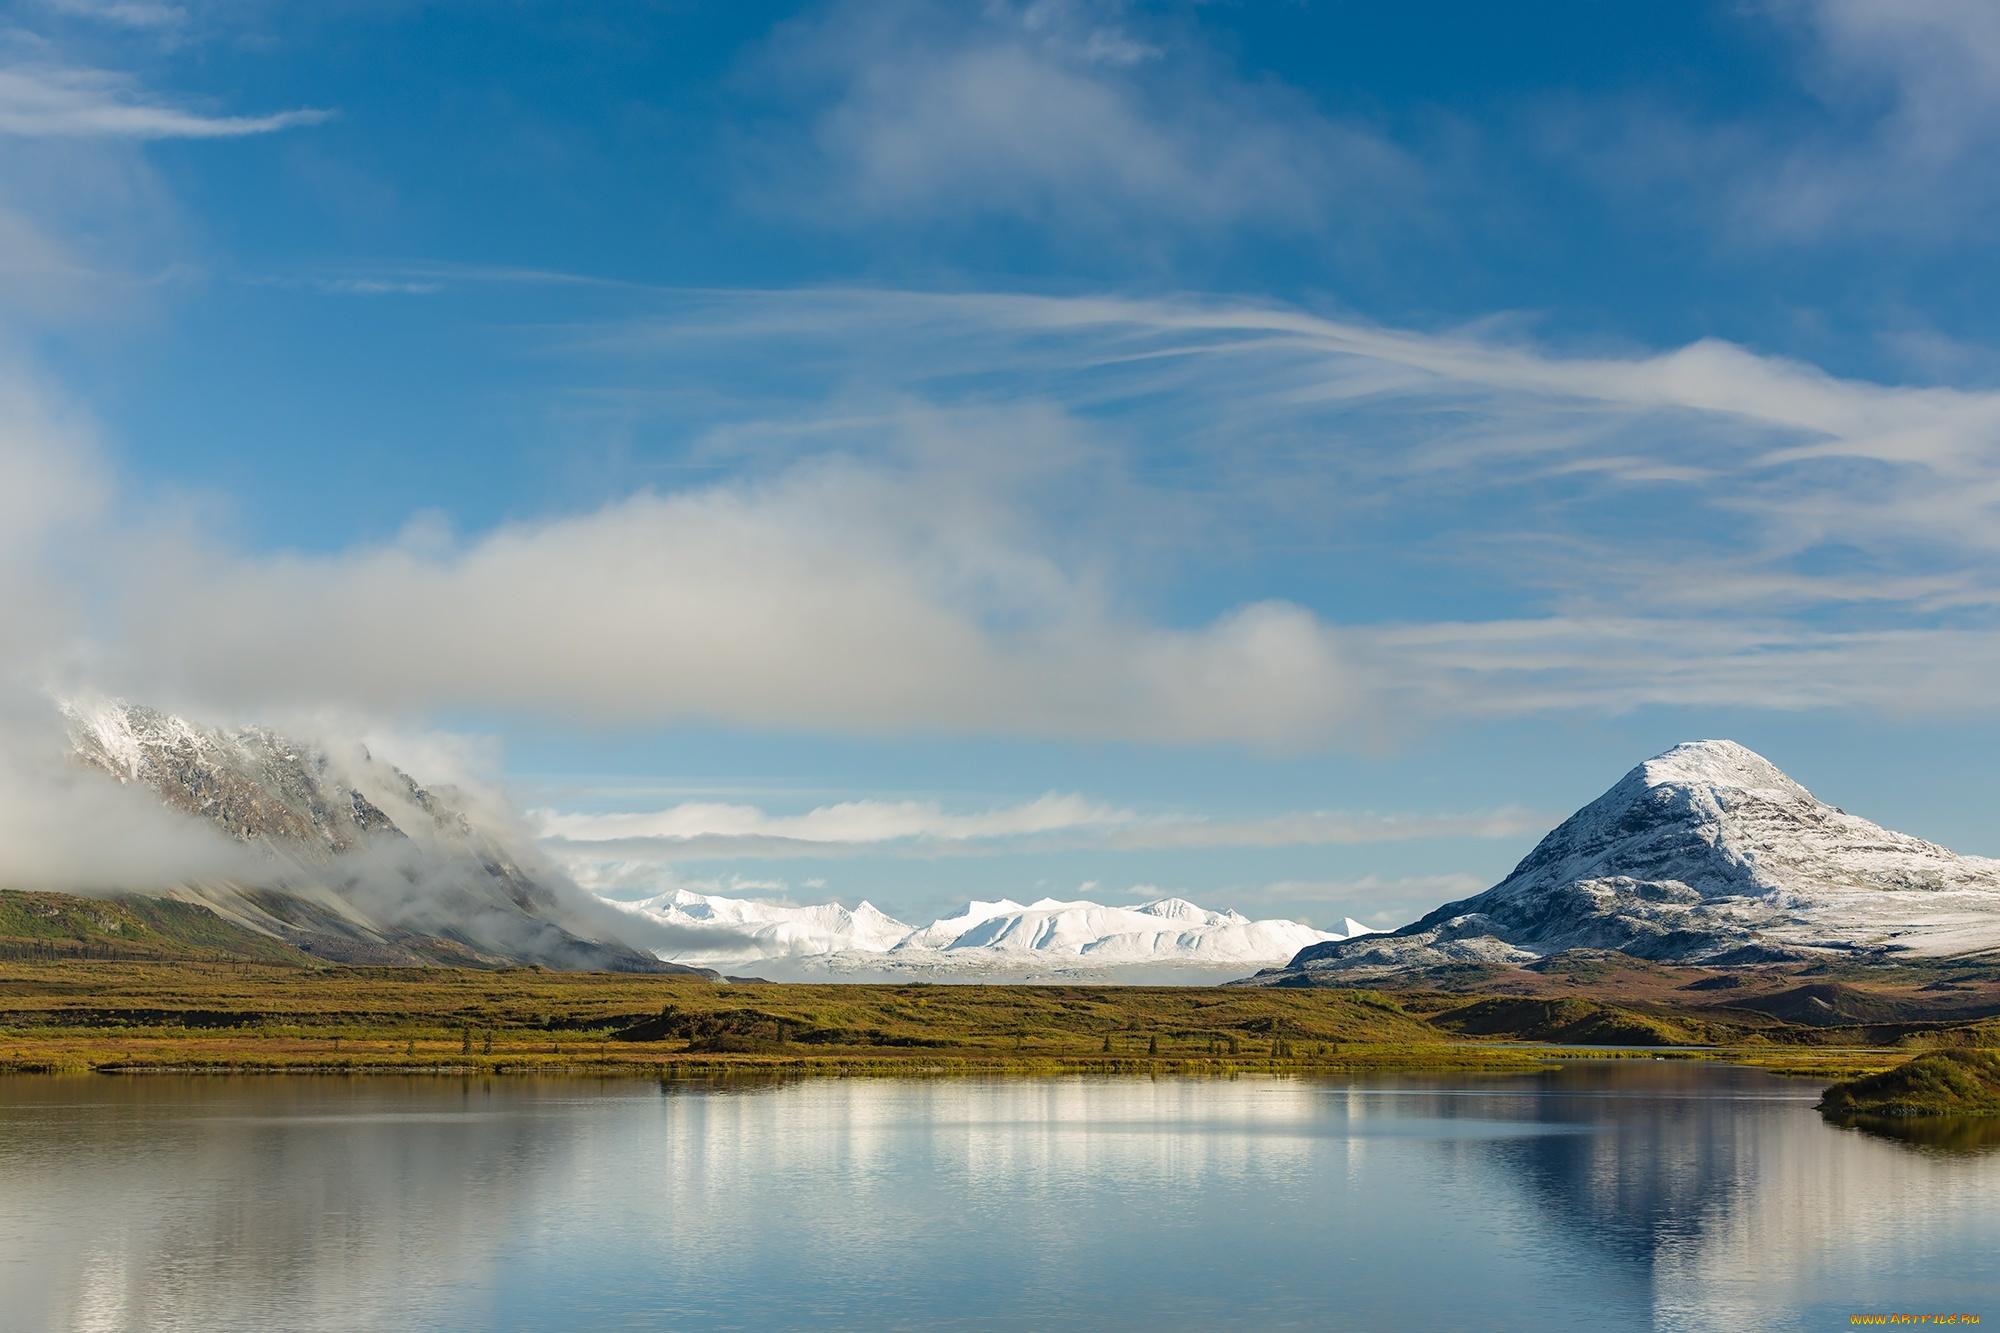 Alaska Range, Ruth Amphitheater, Alaska  № 1442151 загрузить